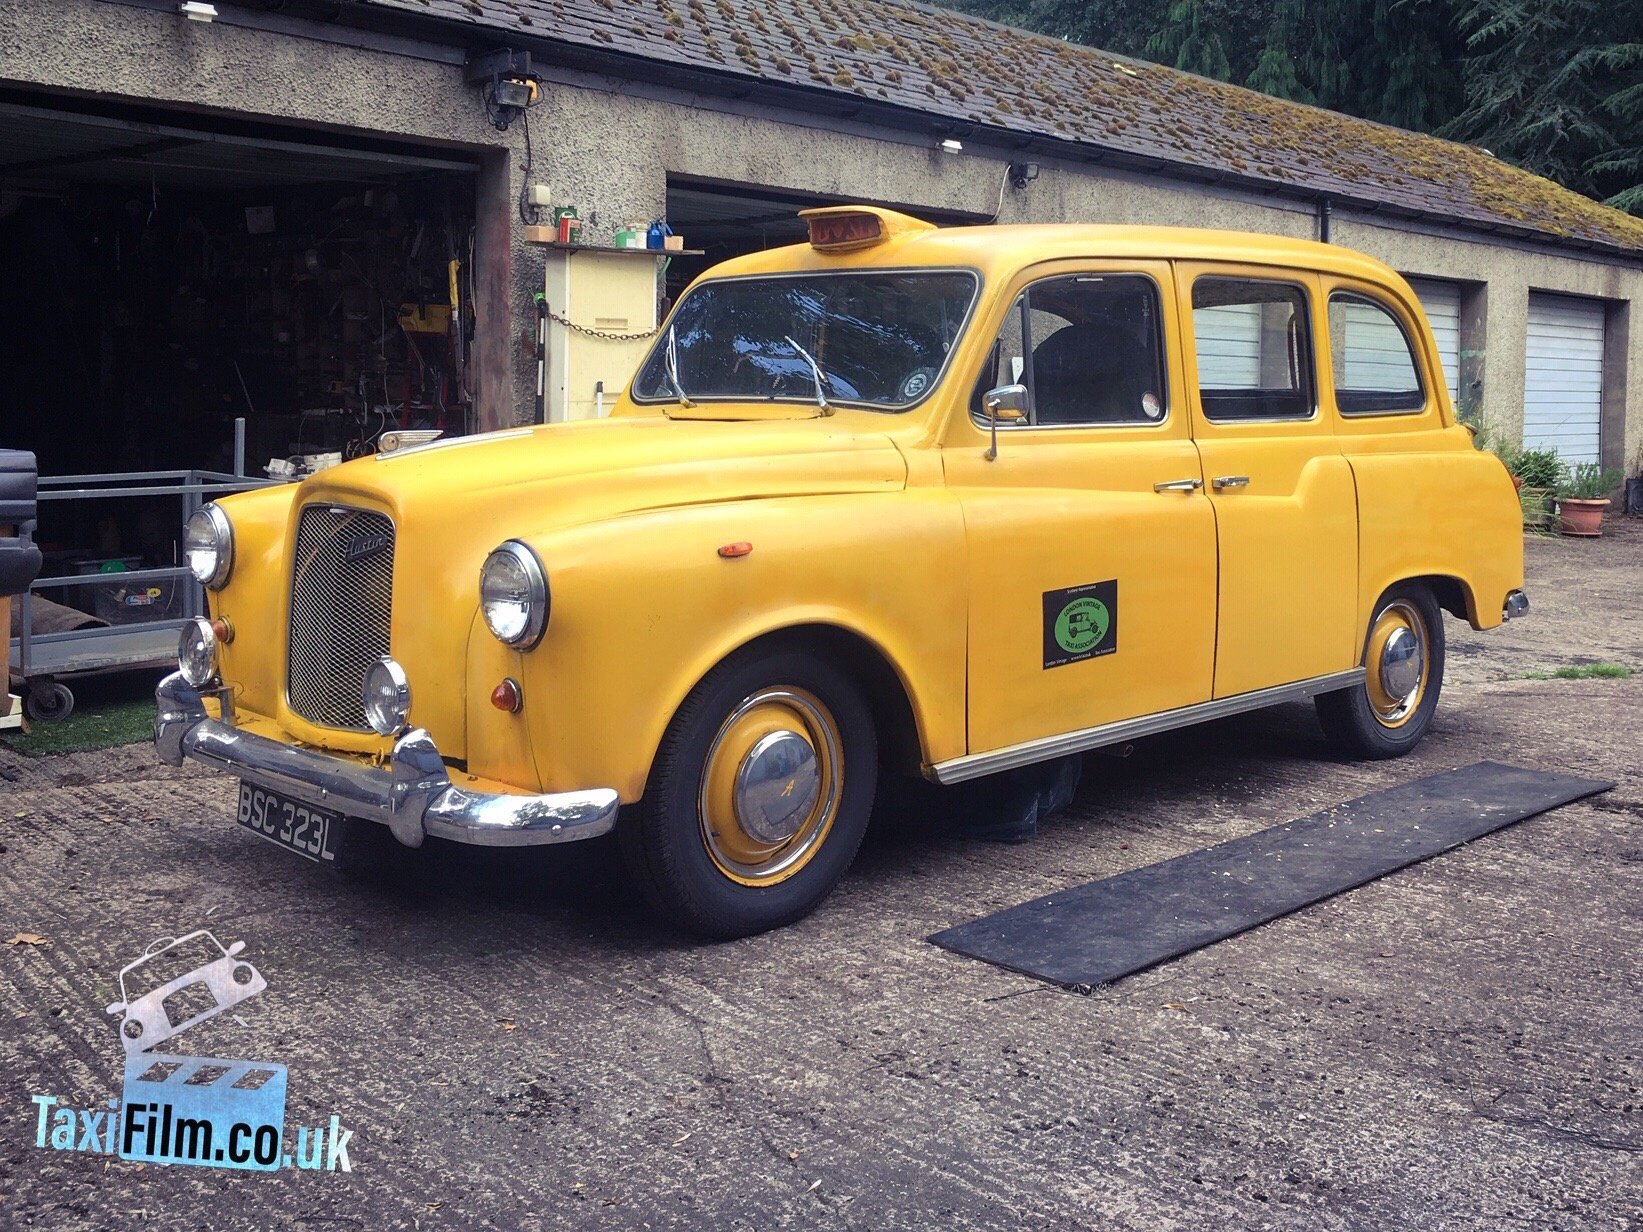 Yellow FX4 Taxi 1971, Edinburgh ref F0102